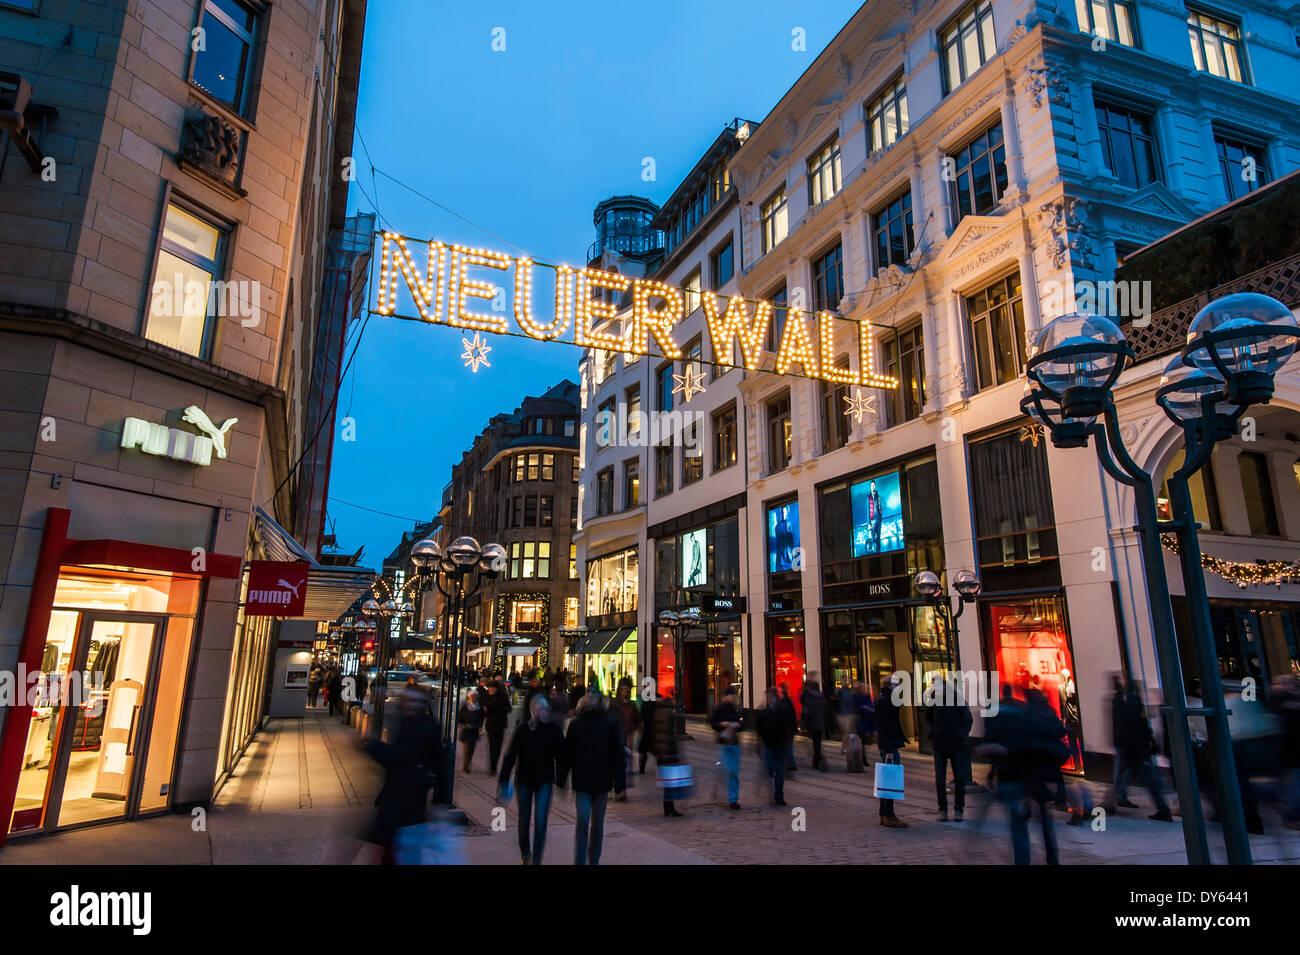 Shopping street in hamburg called neuer wall at christmas for Ligne roset hamburg neuer wall